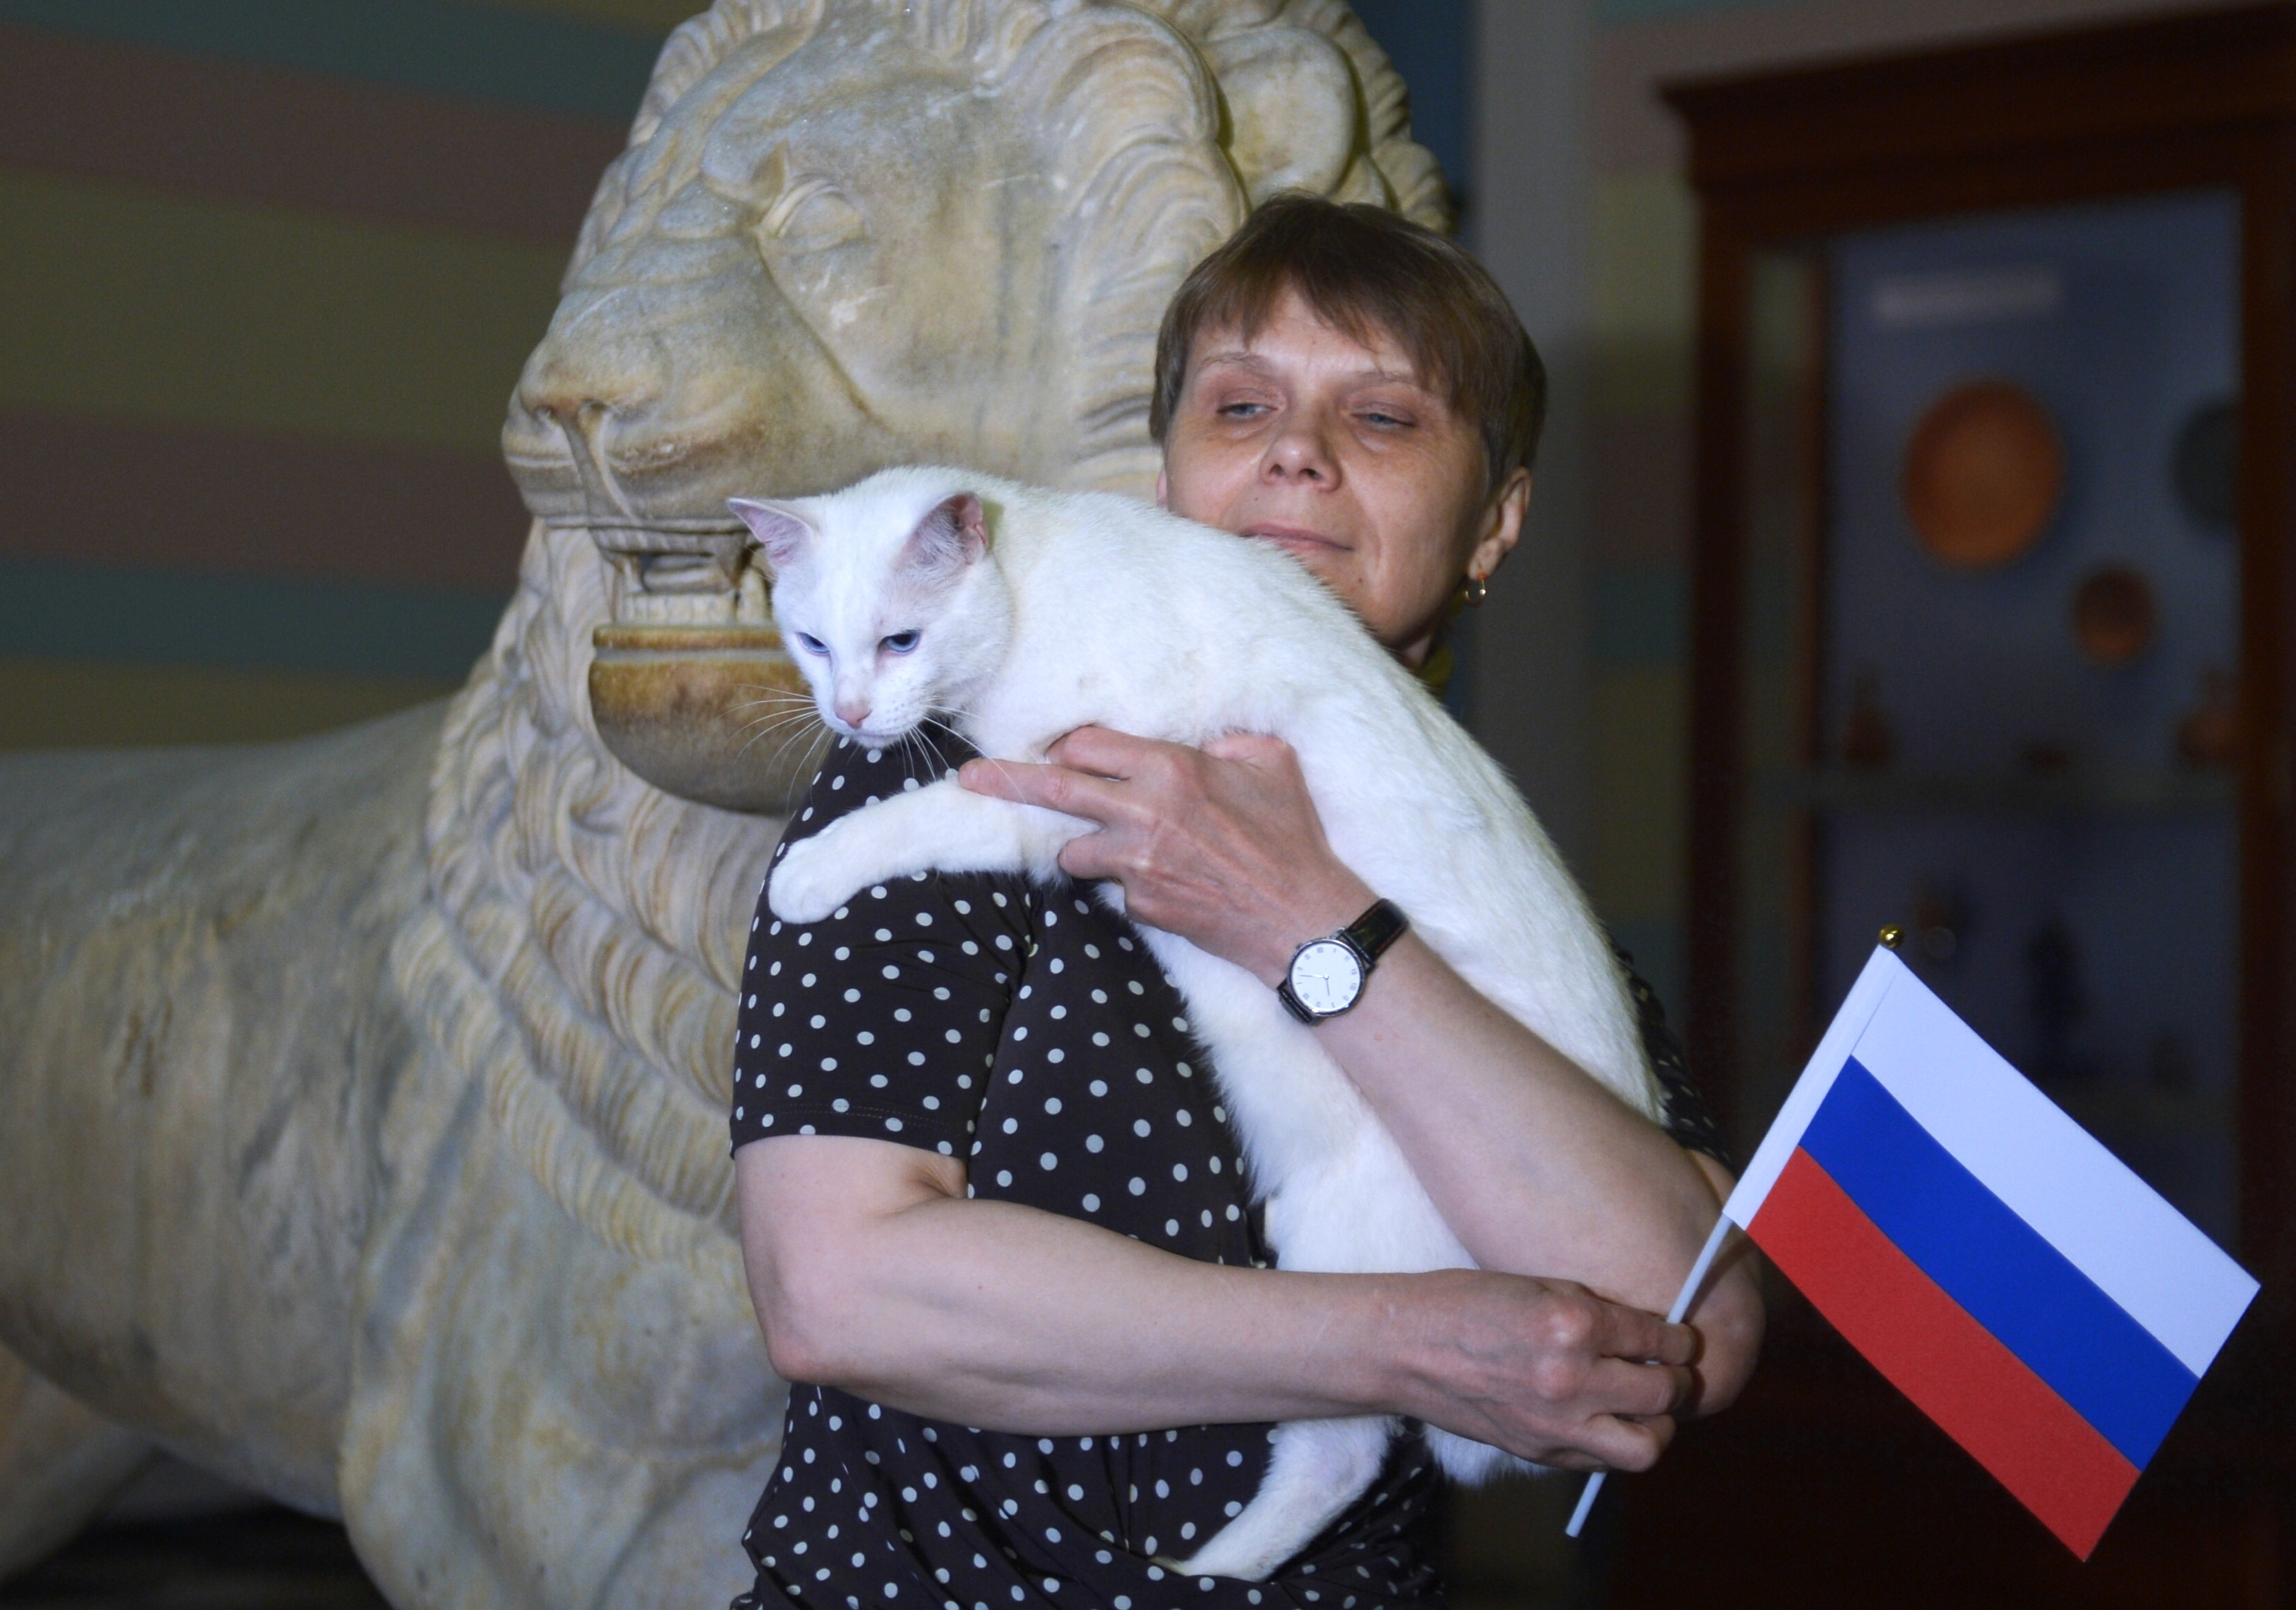 <p>Фото: &copy; РИА Новости/Александр Гальперин</p>